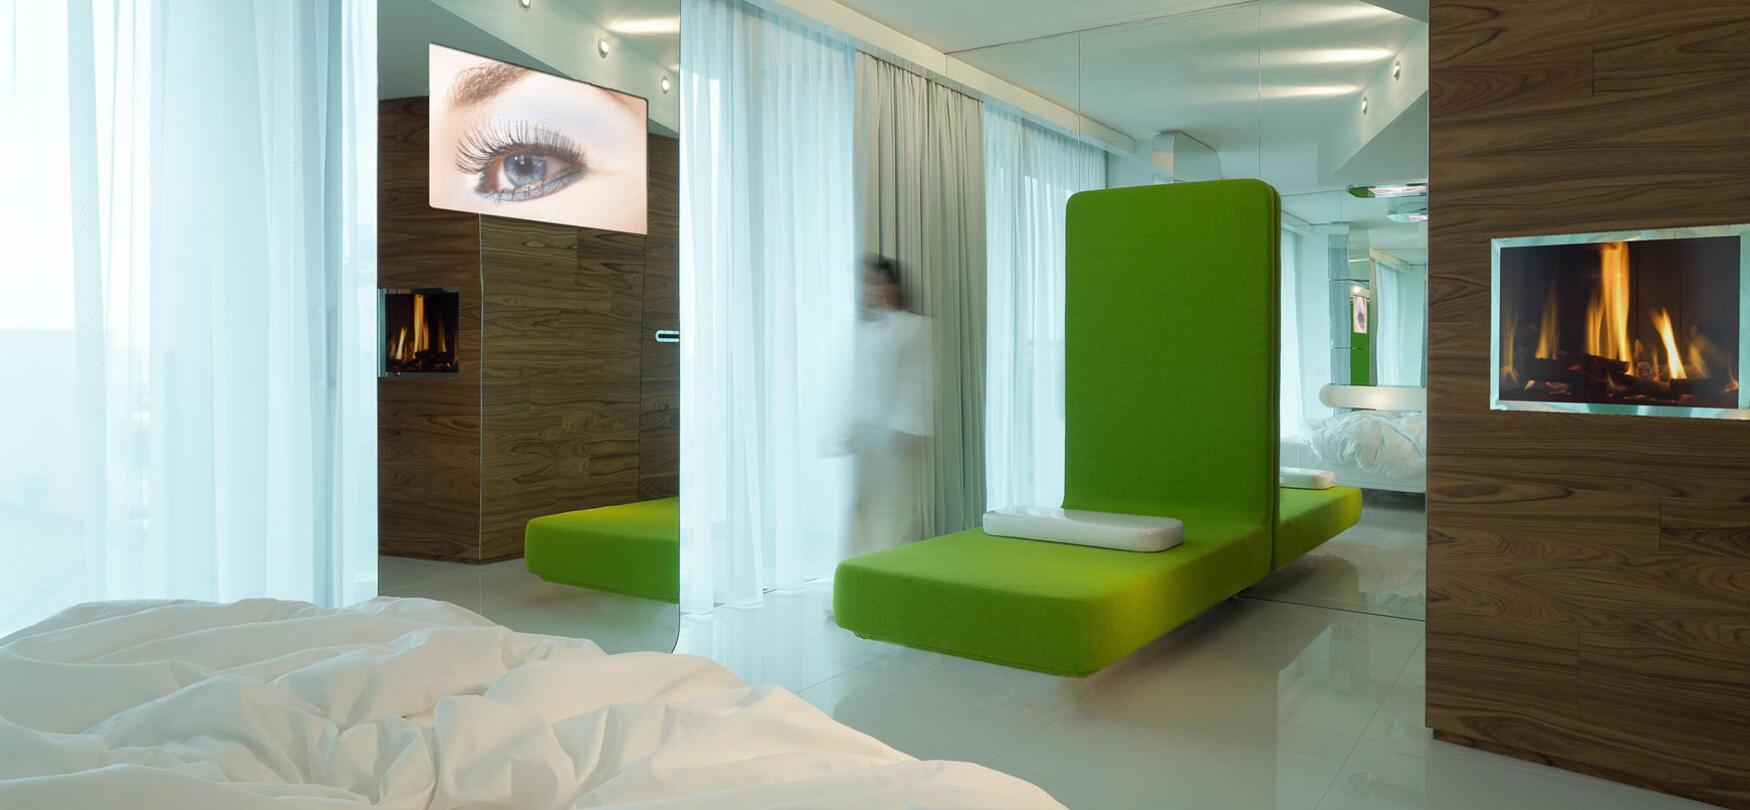 ambienthotels en rooms-isuite 006